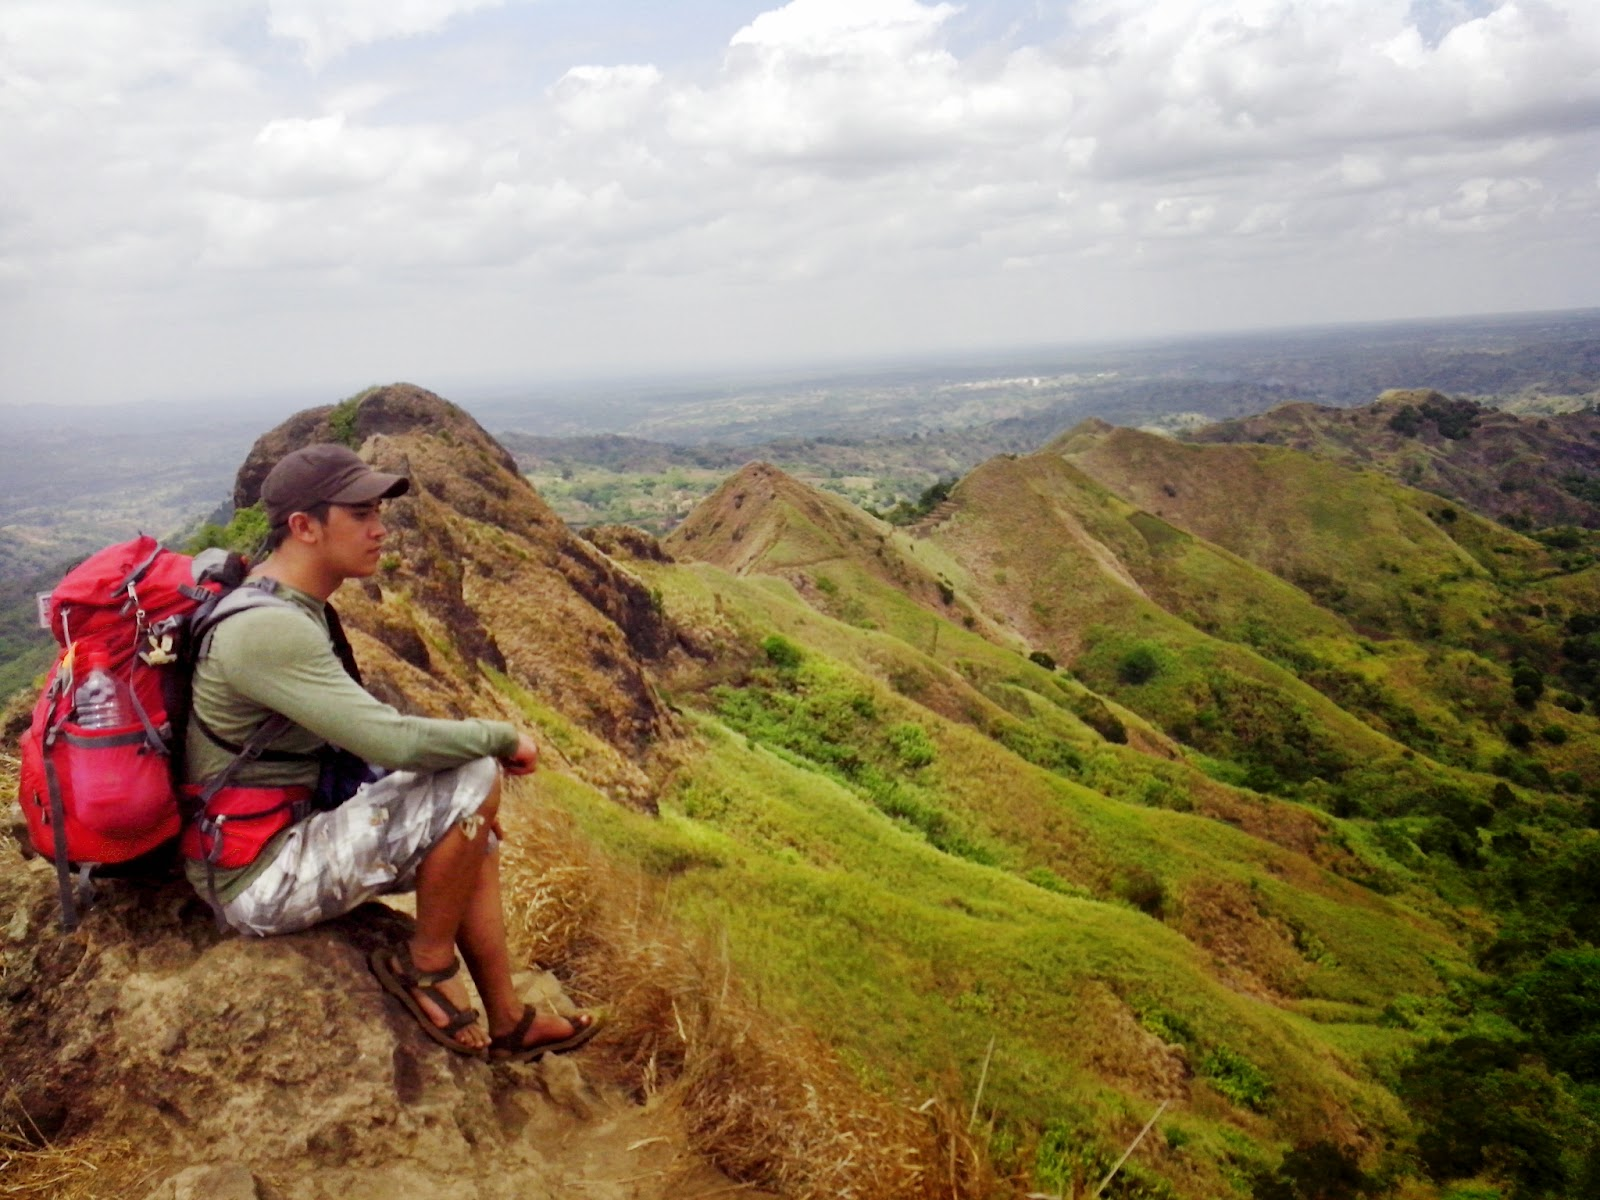 Summits of Mt. Batulao